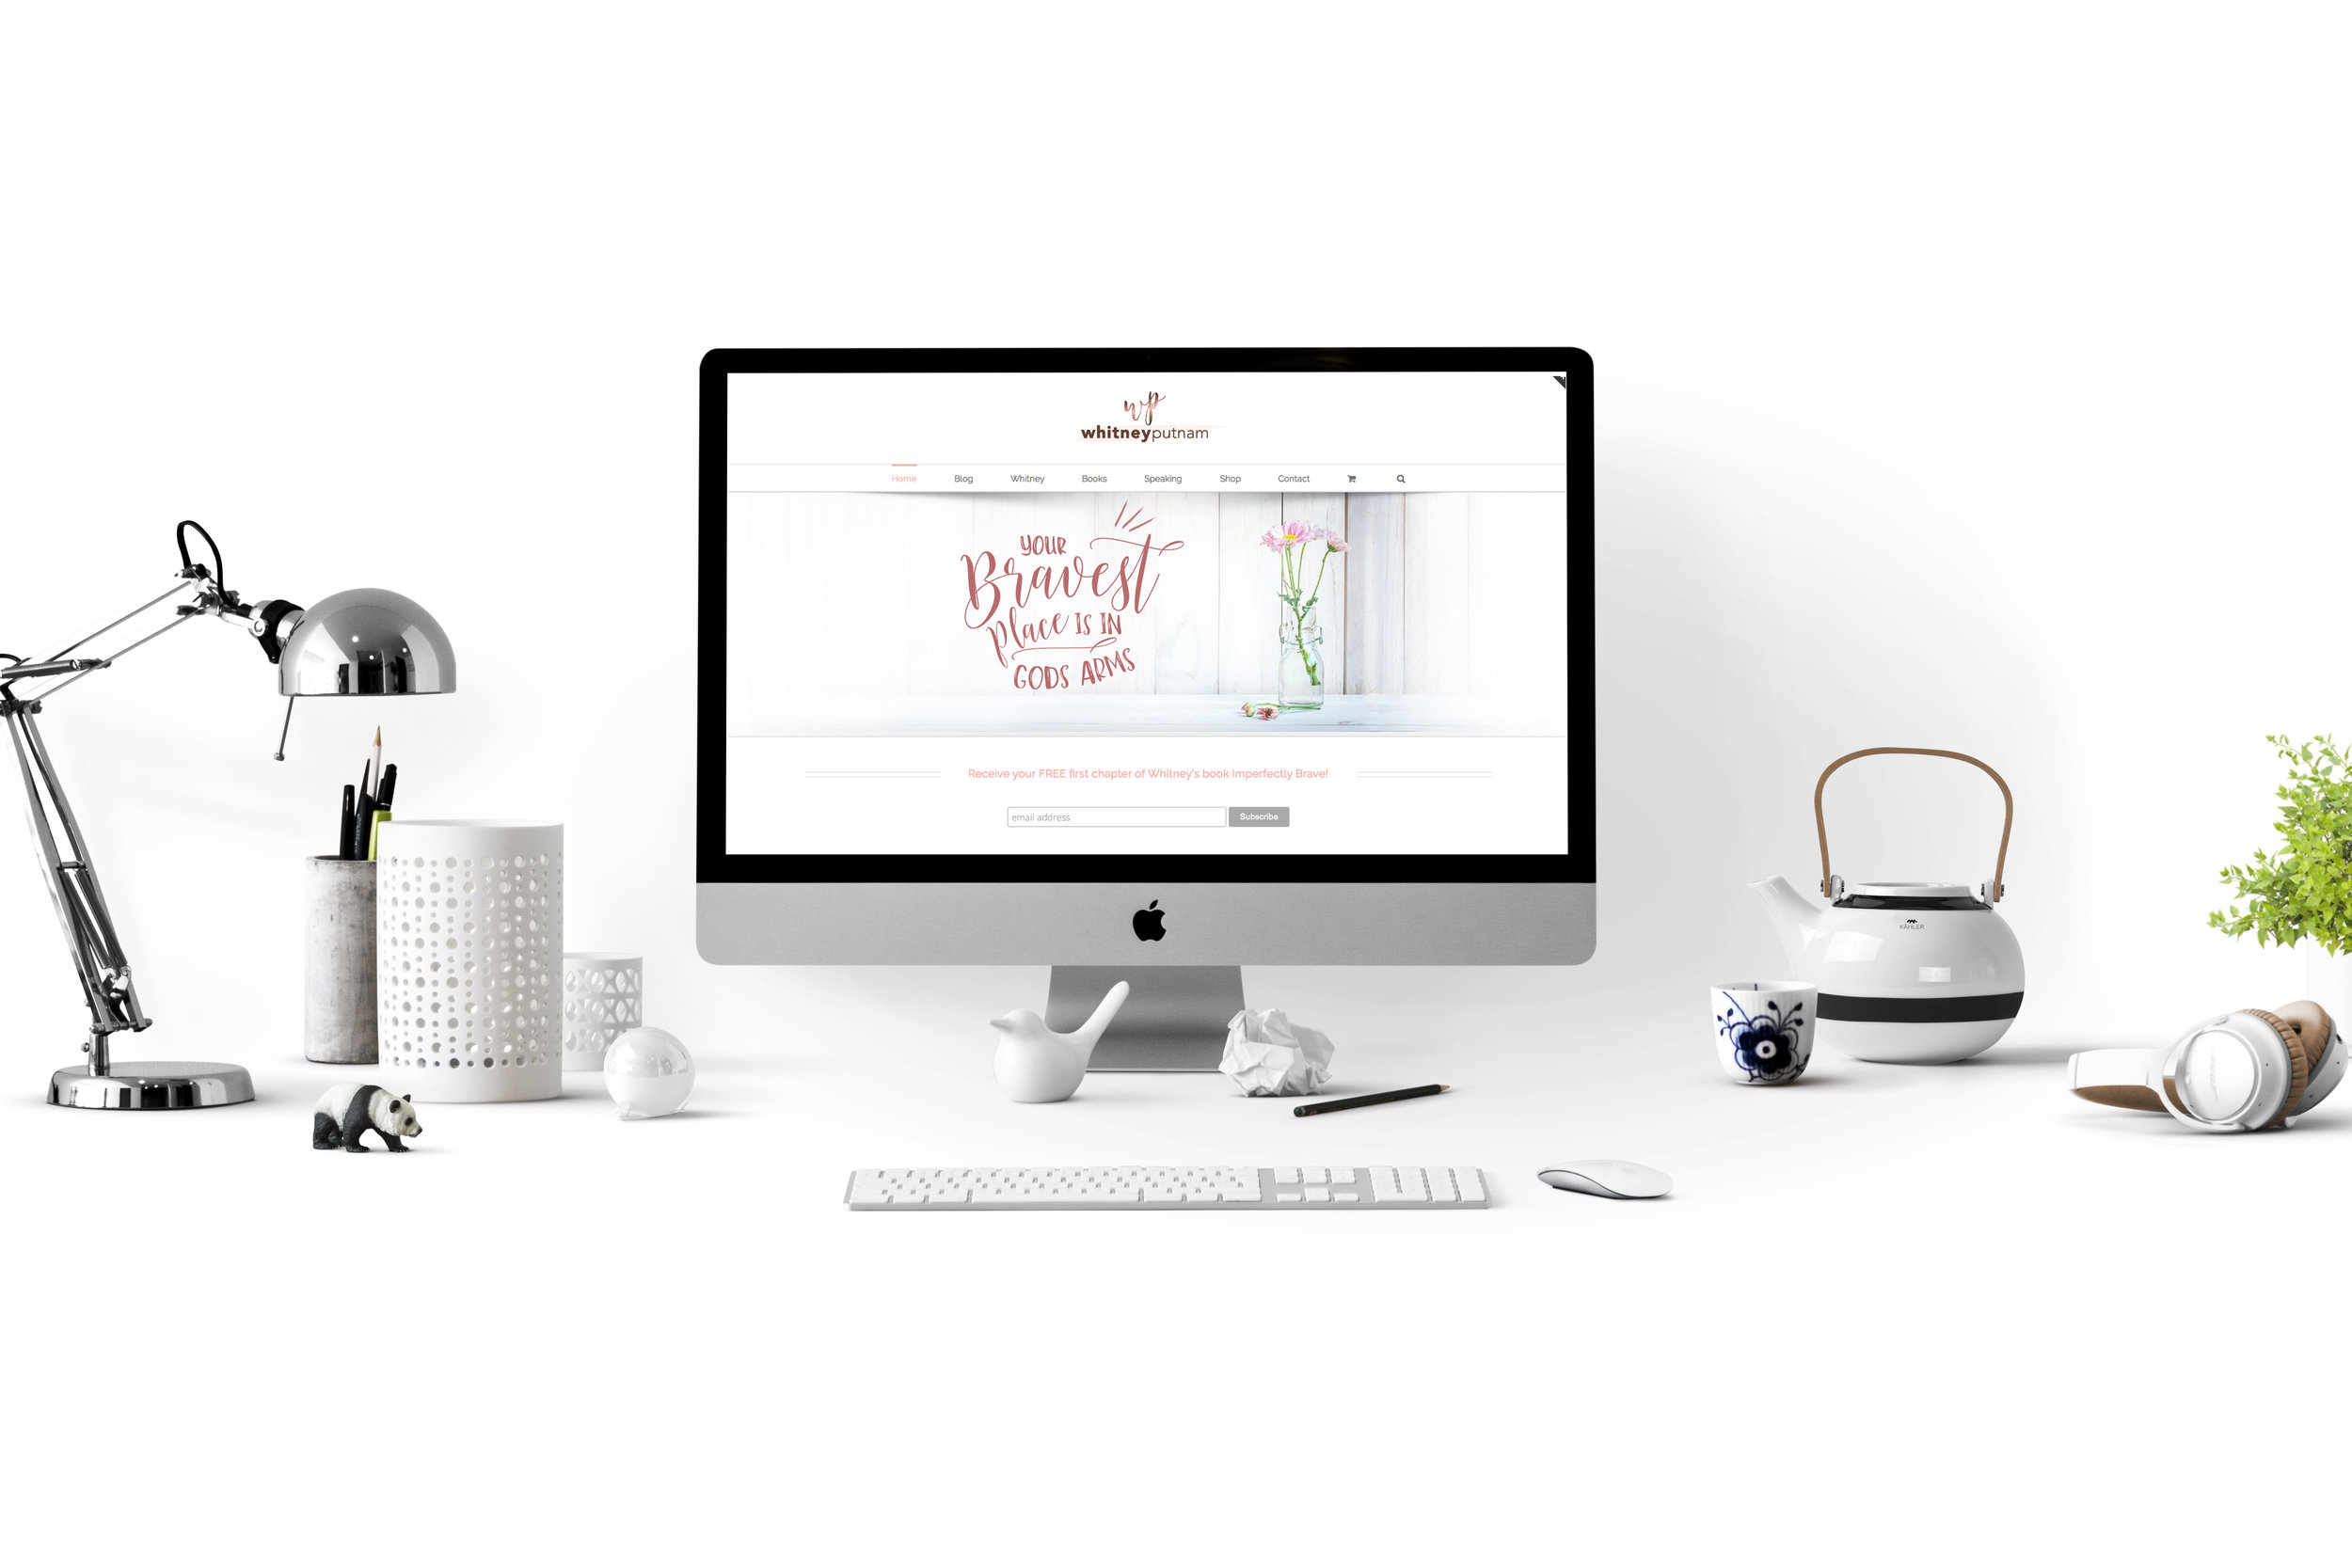 Whitney putnam web desktop.jpg